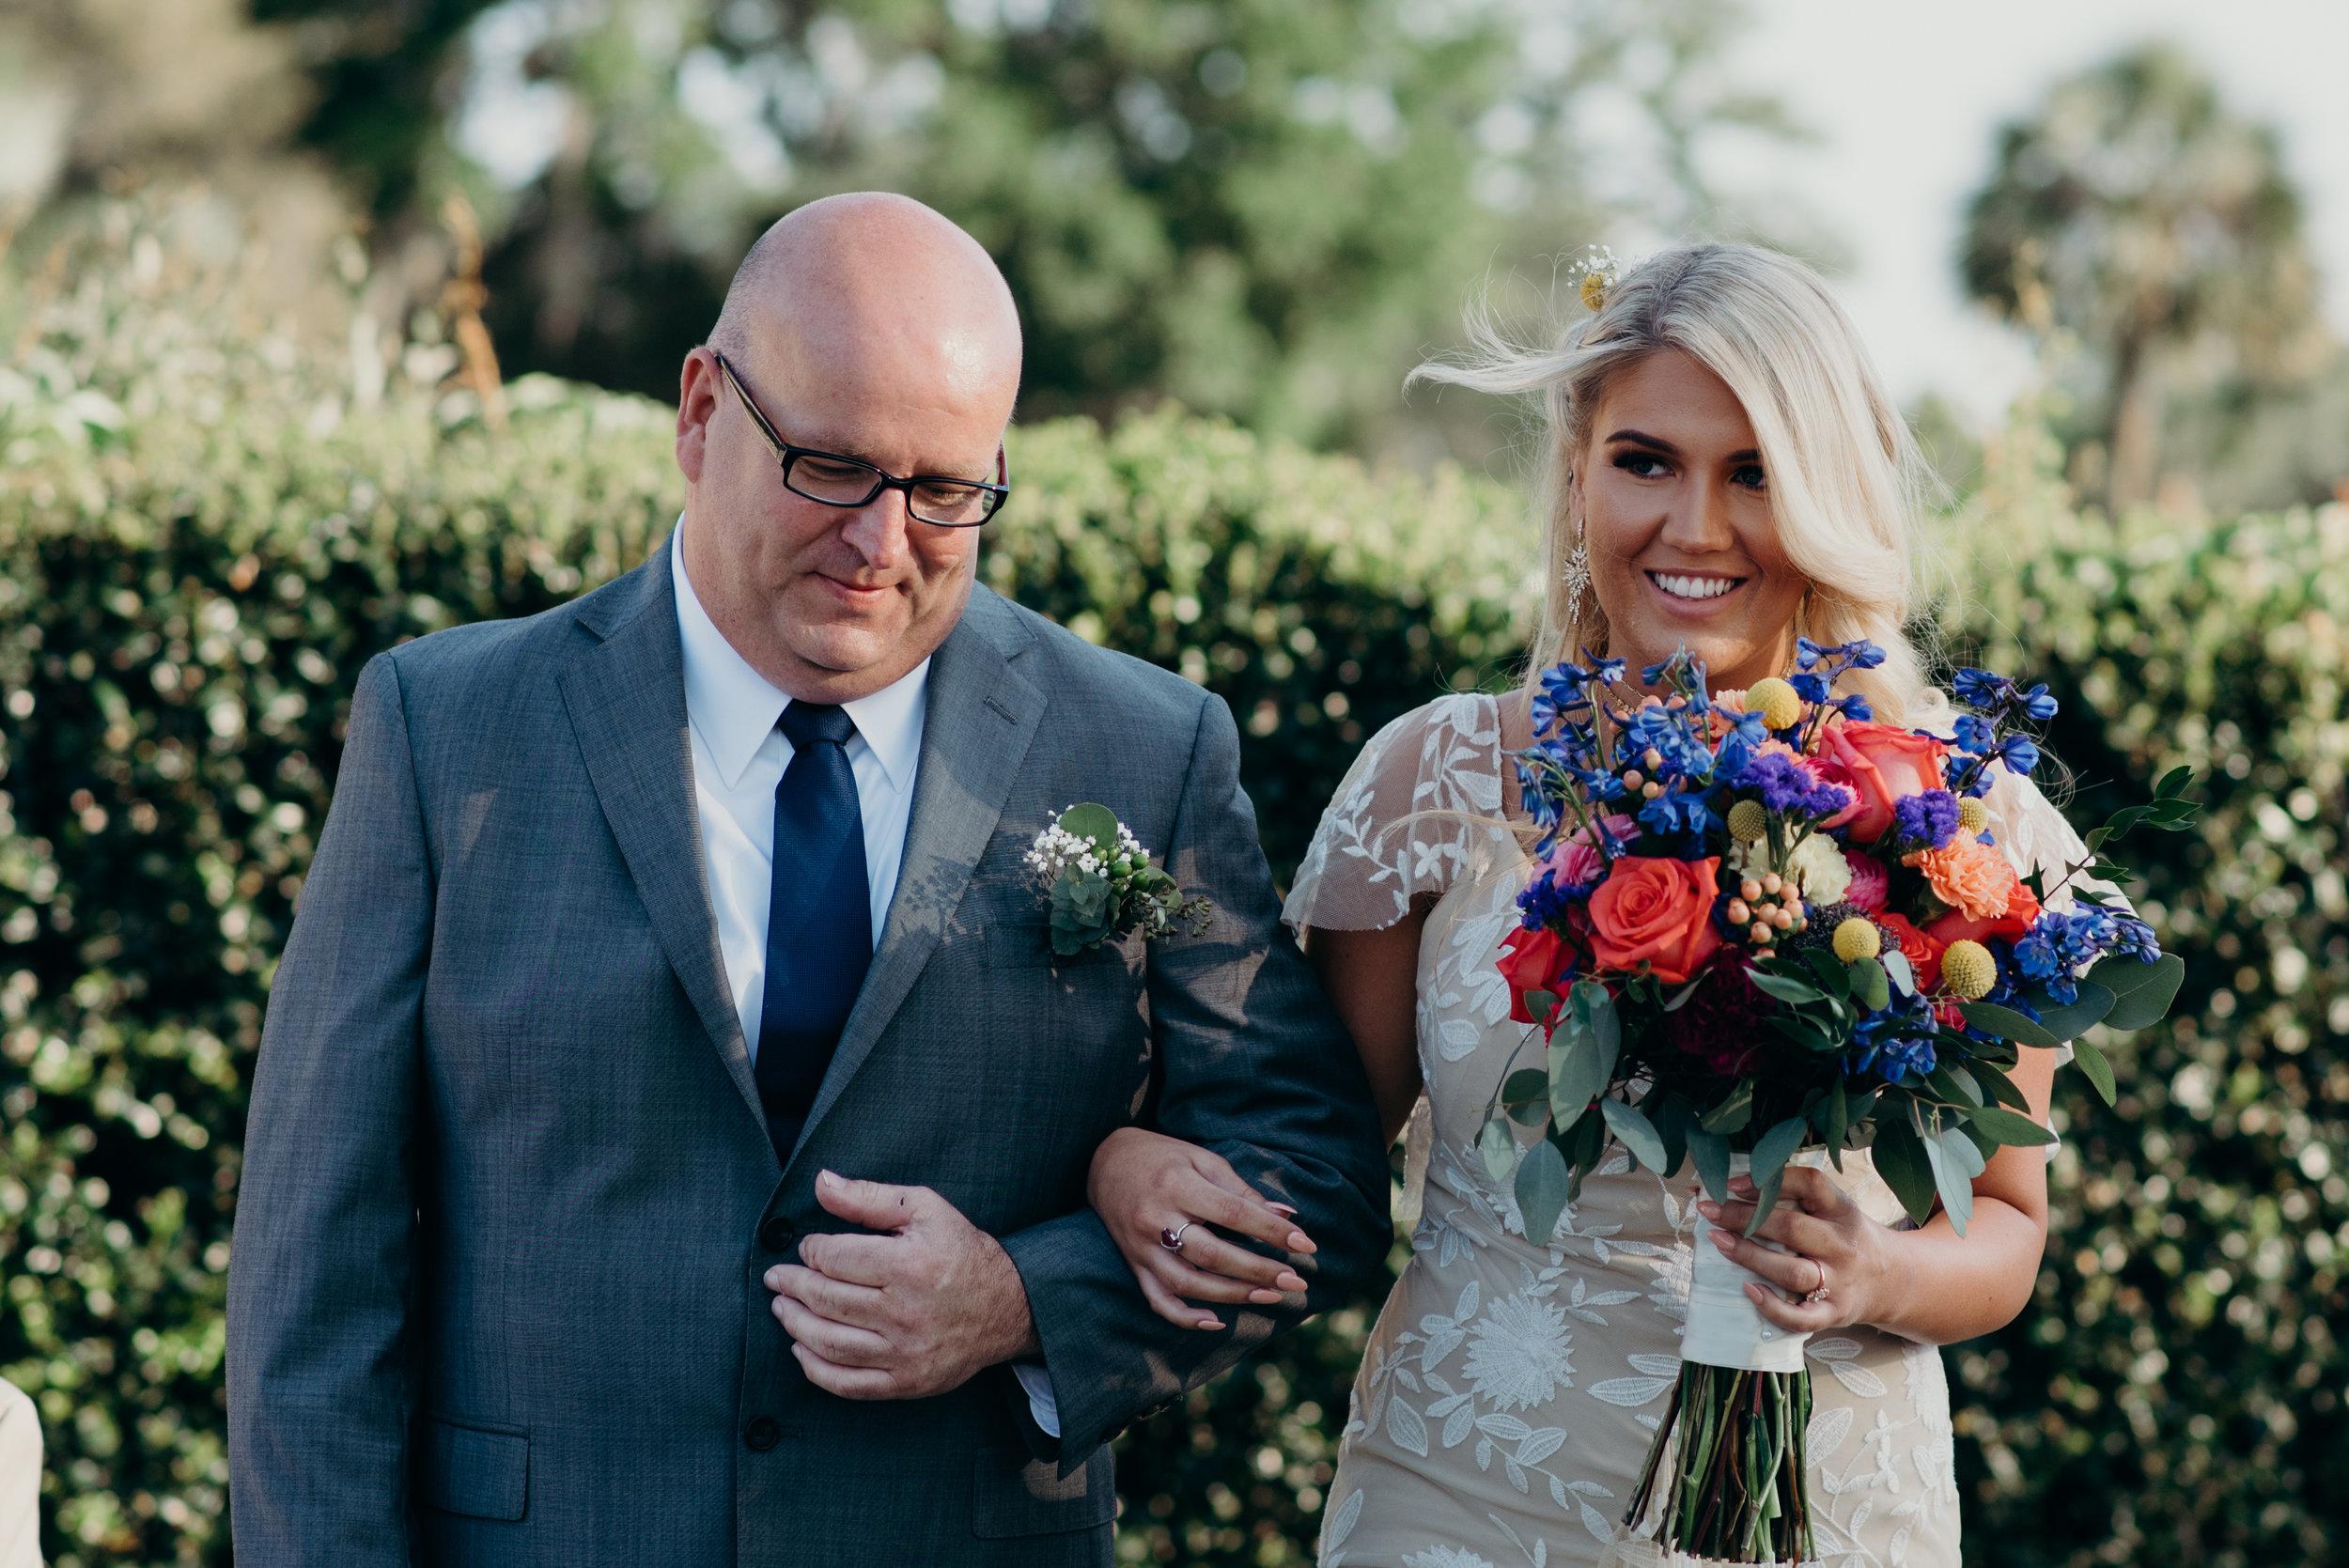 zayda-collin-panama-city-wedding-photography-trippy-bohemian-lisa-frank-wedding-ceremony-47.jpg